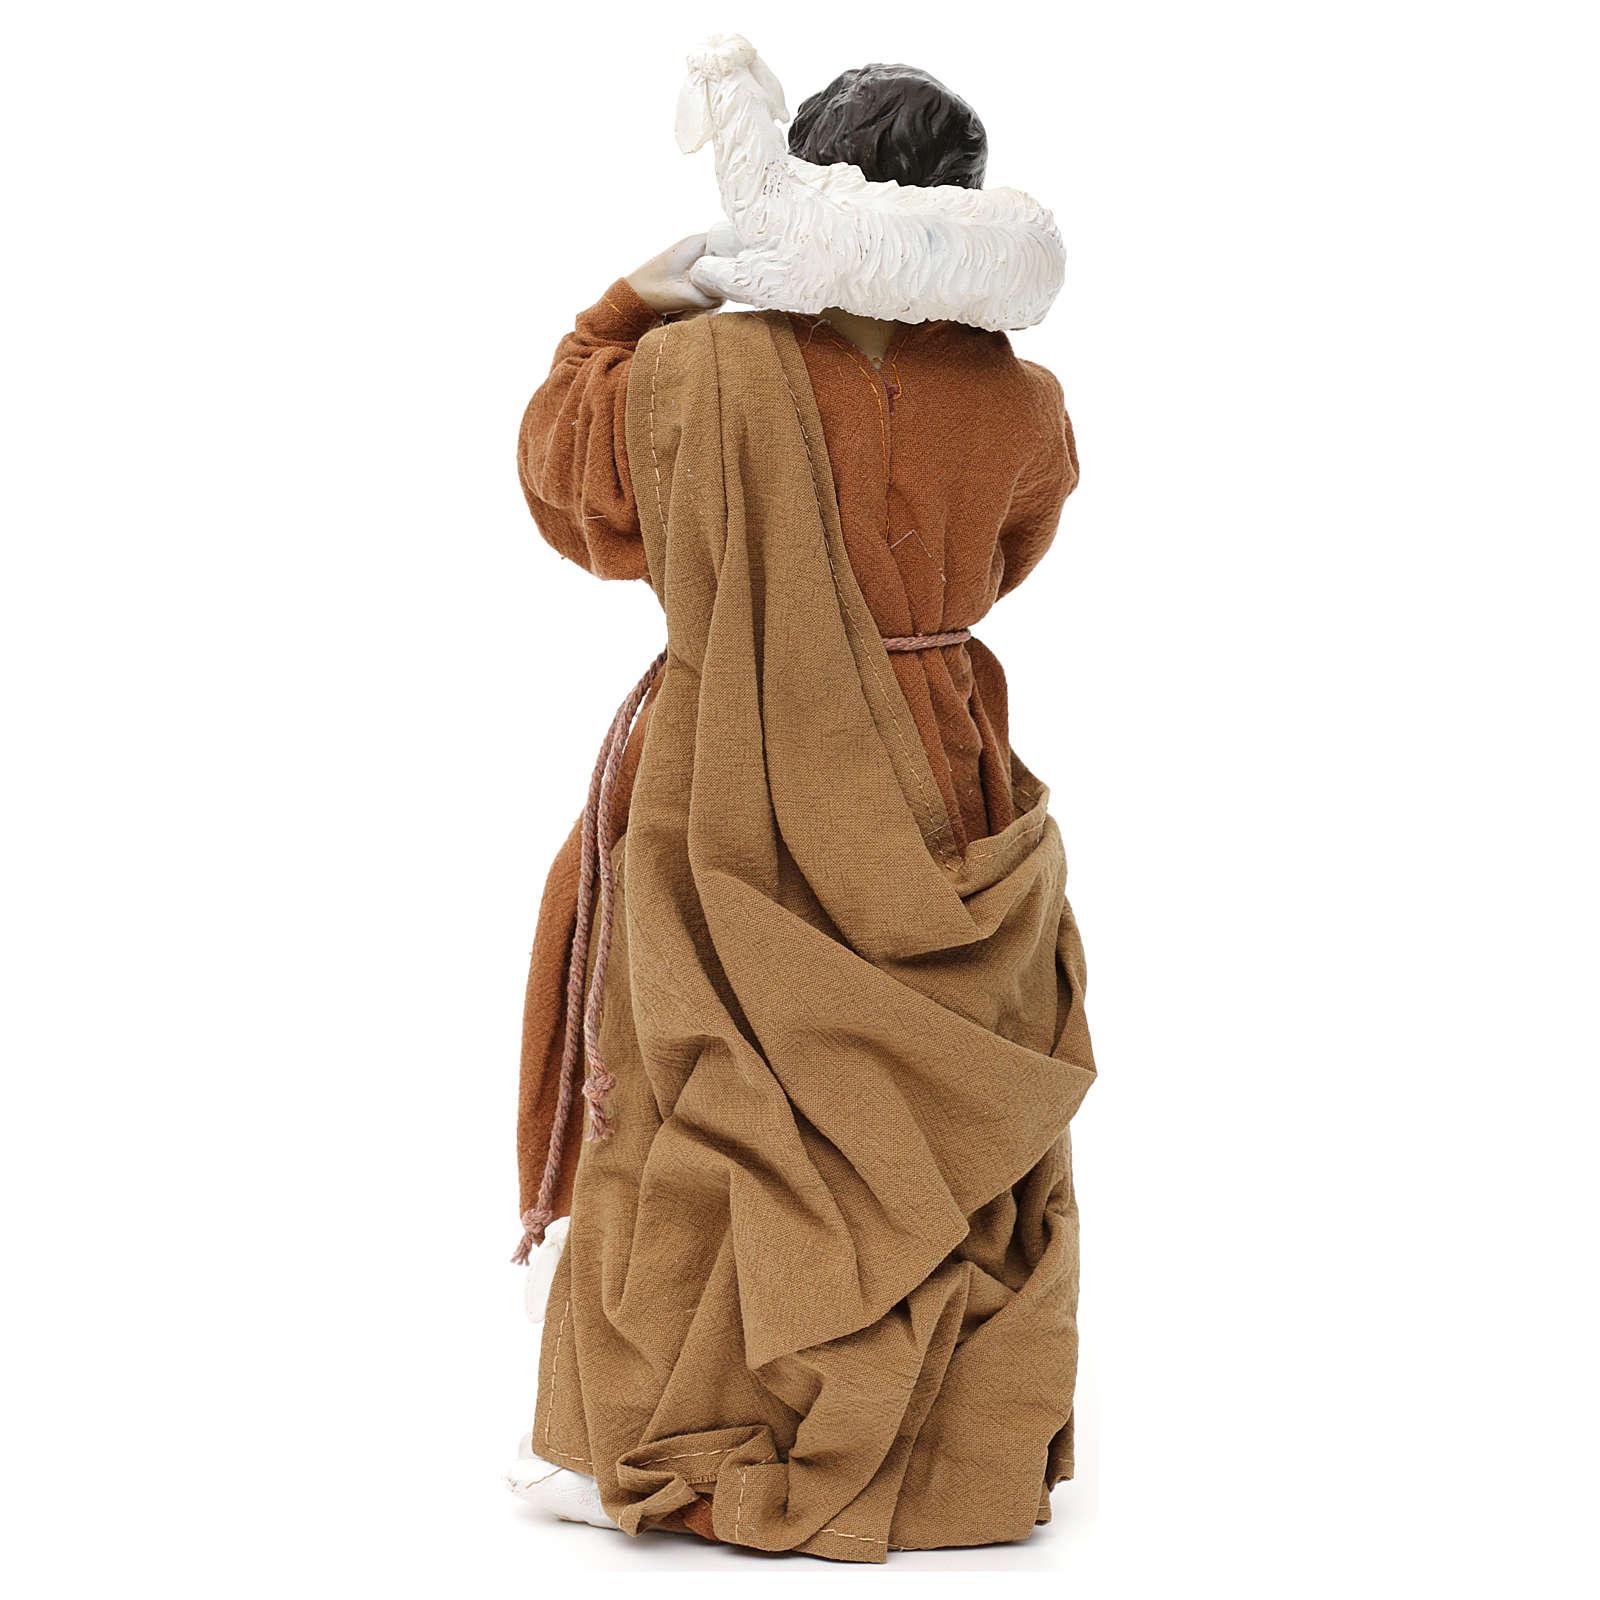 Pastor con oveja sobre las espaldas resina coloreada 30 cm 3